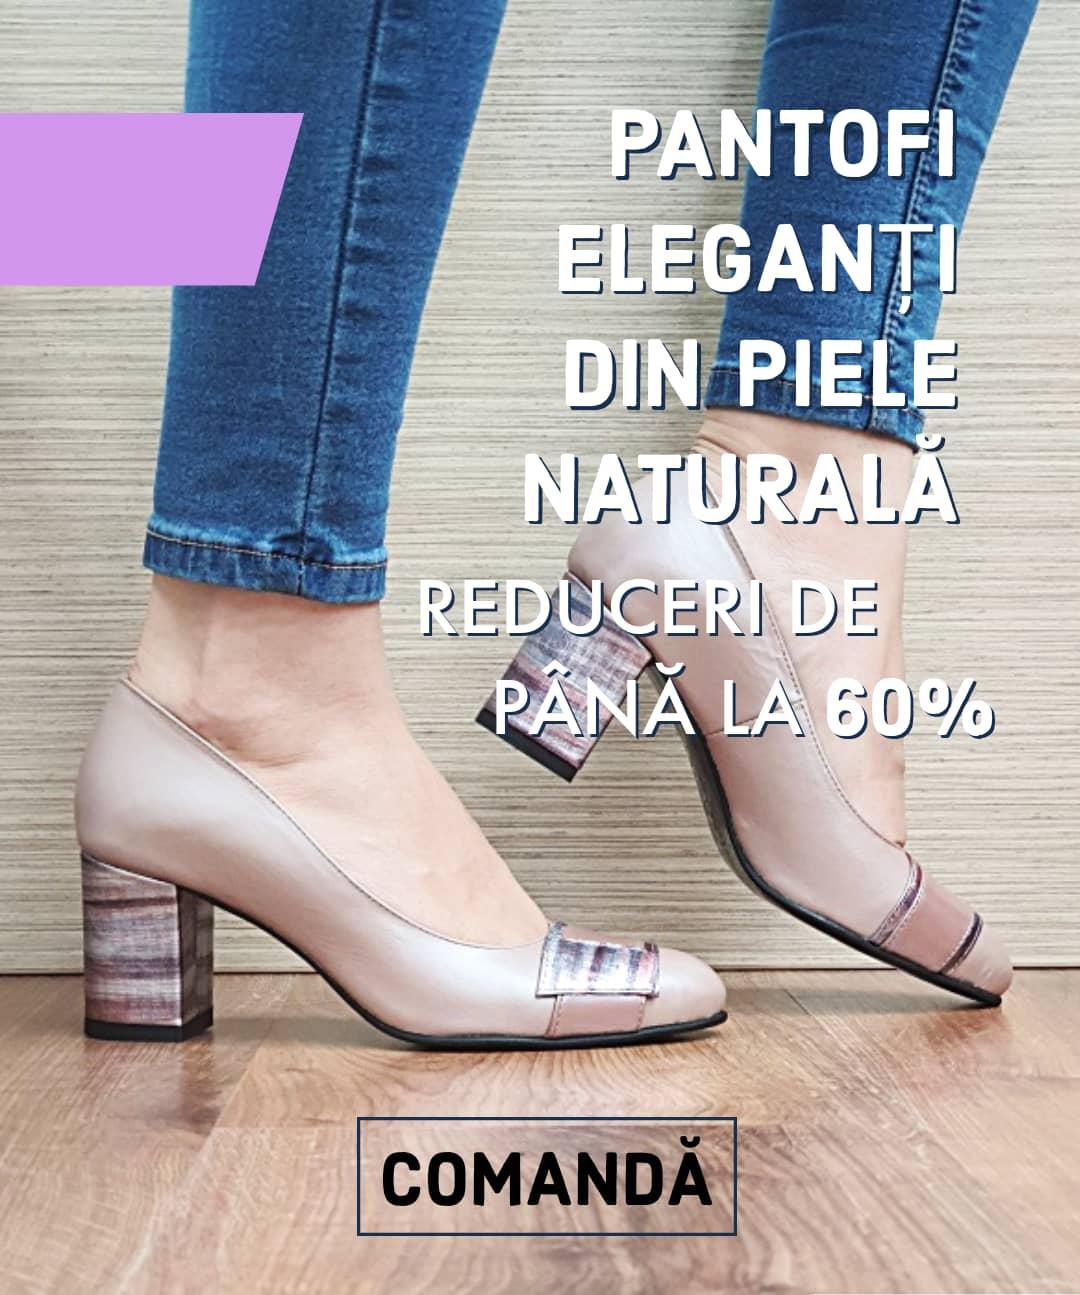 Pantofi Eleganti Octombrie 2020